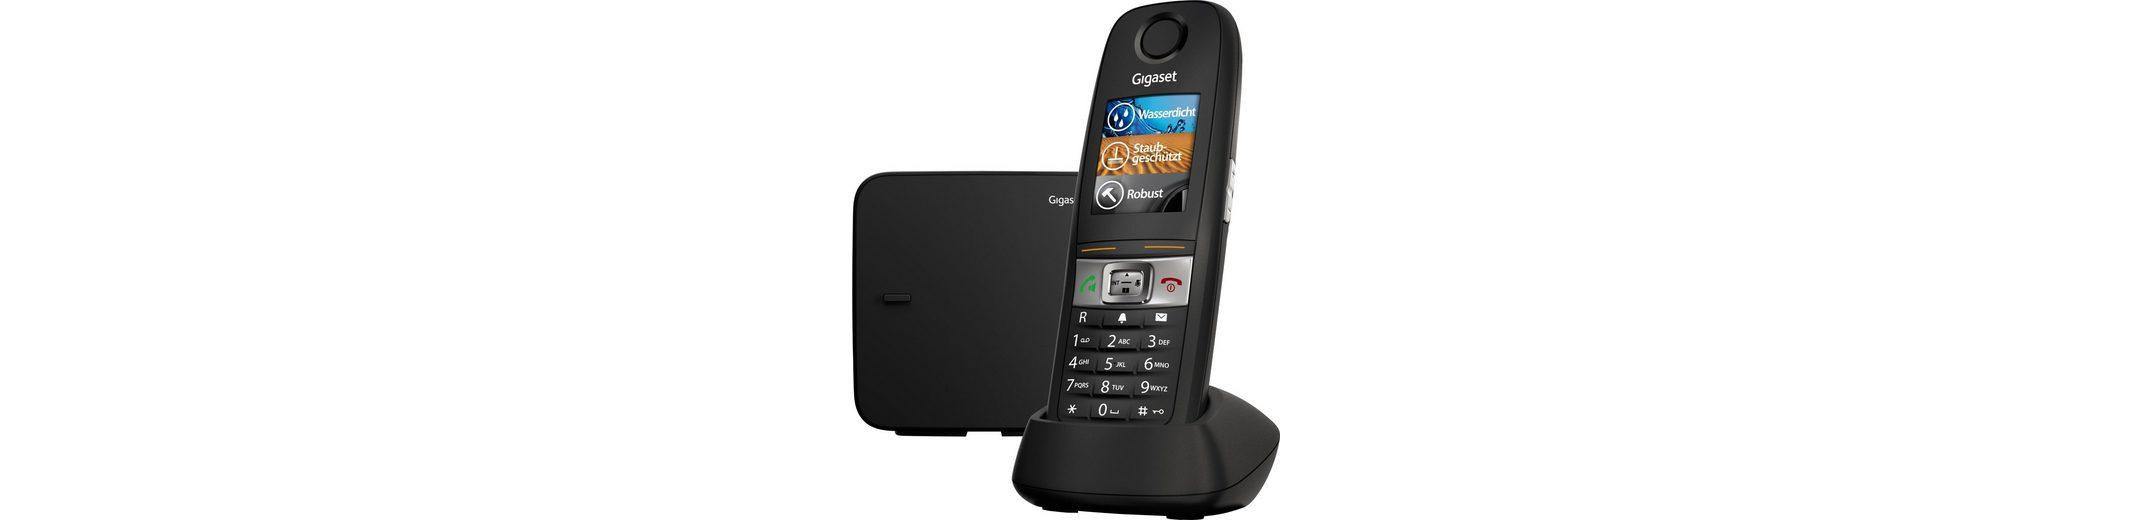 Gigaset E630 Schnurloses DECT Telefon